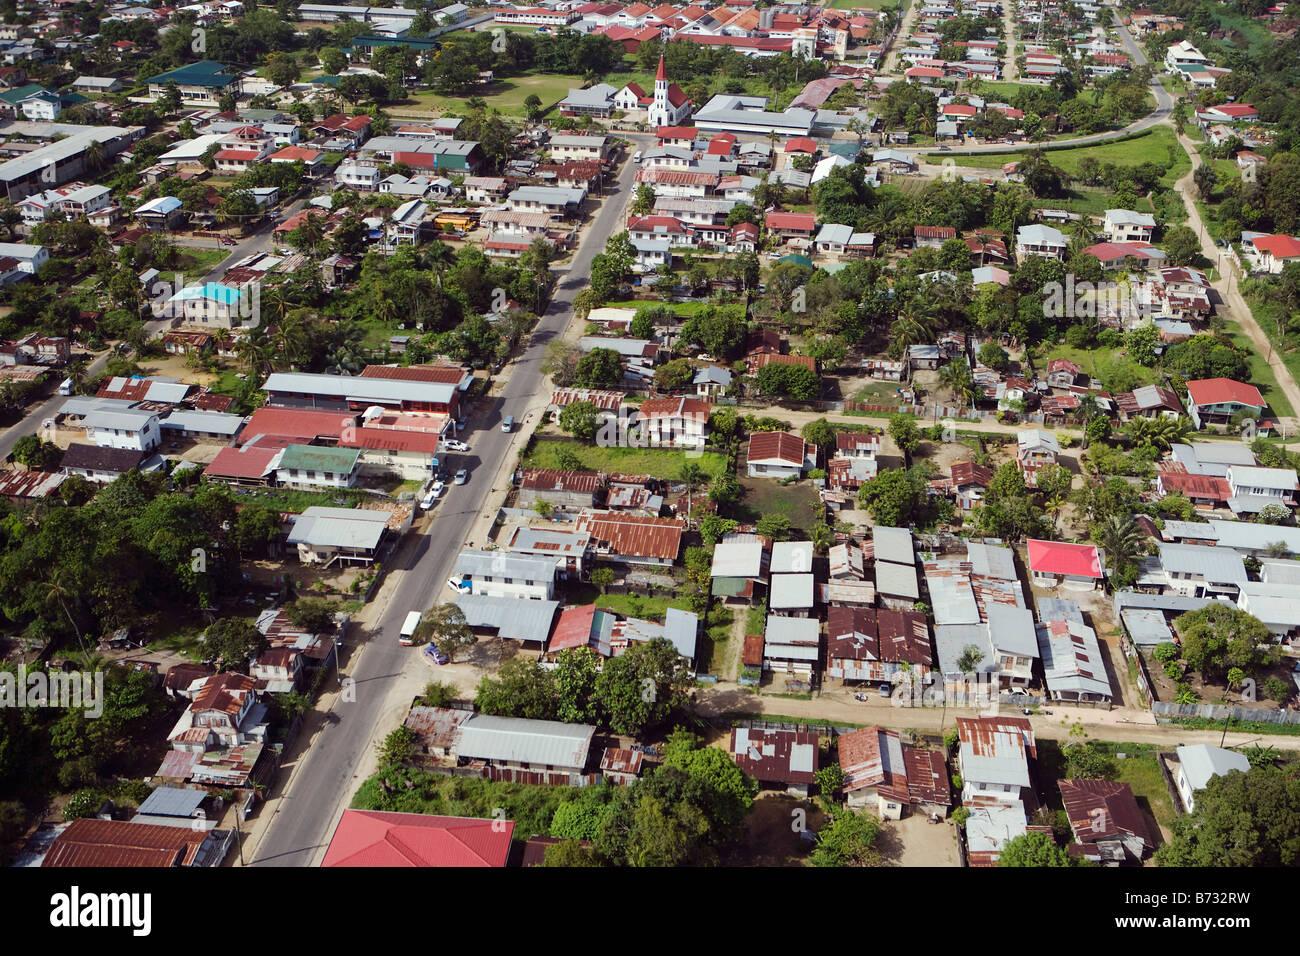 Suriname, Paramaribo, Aerial of residential areas. Stock Photo